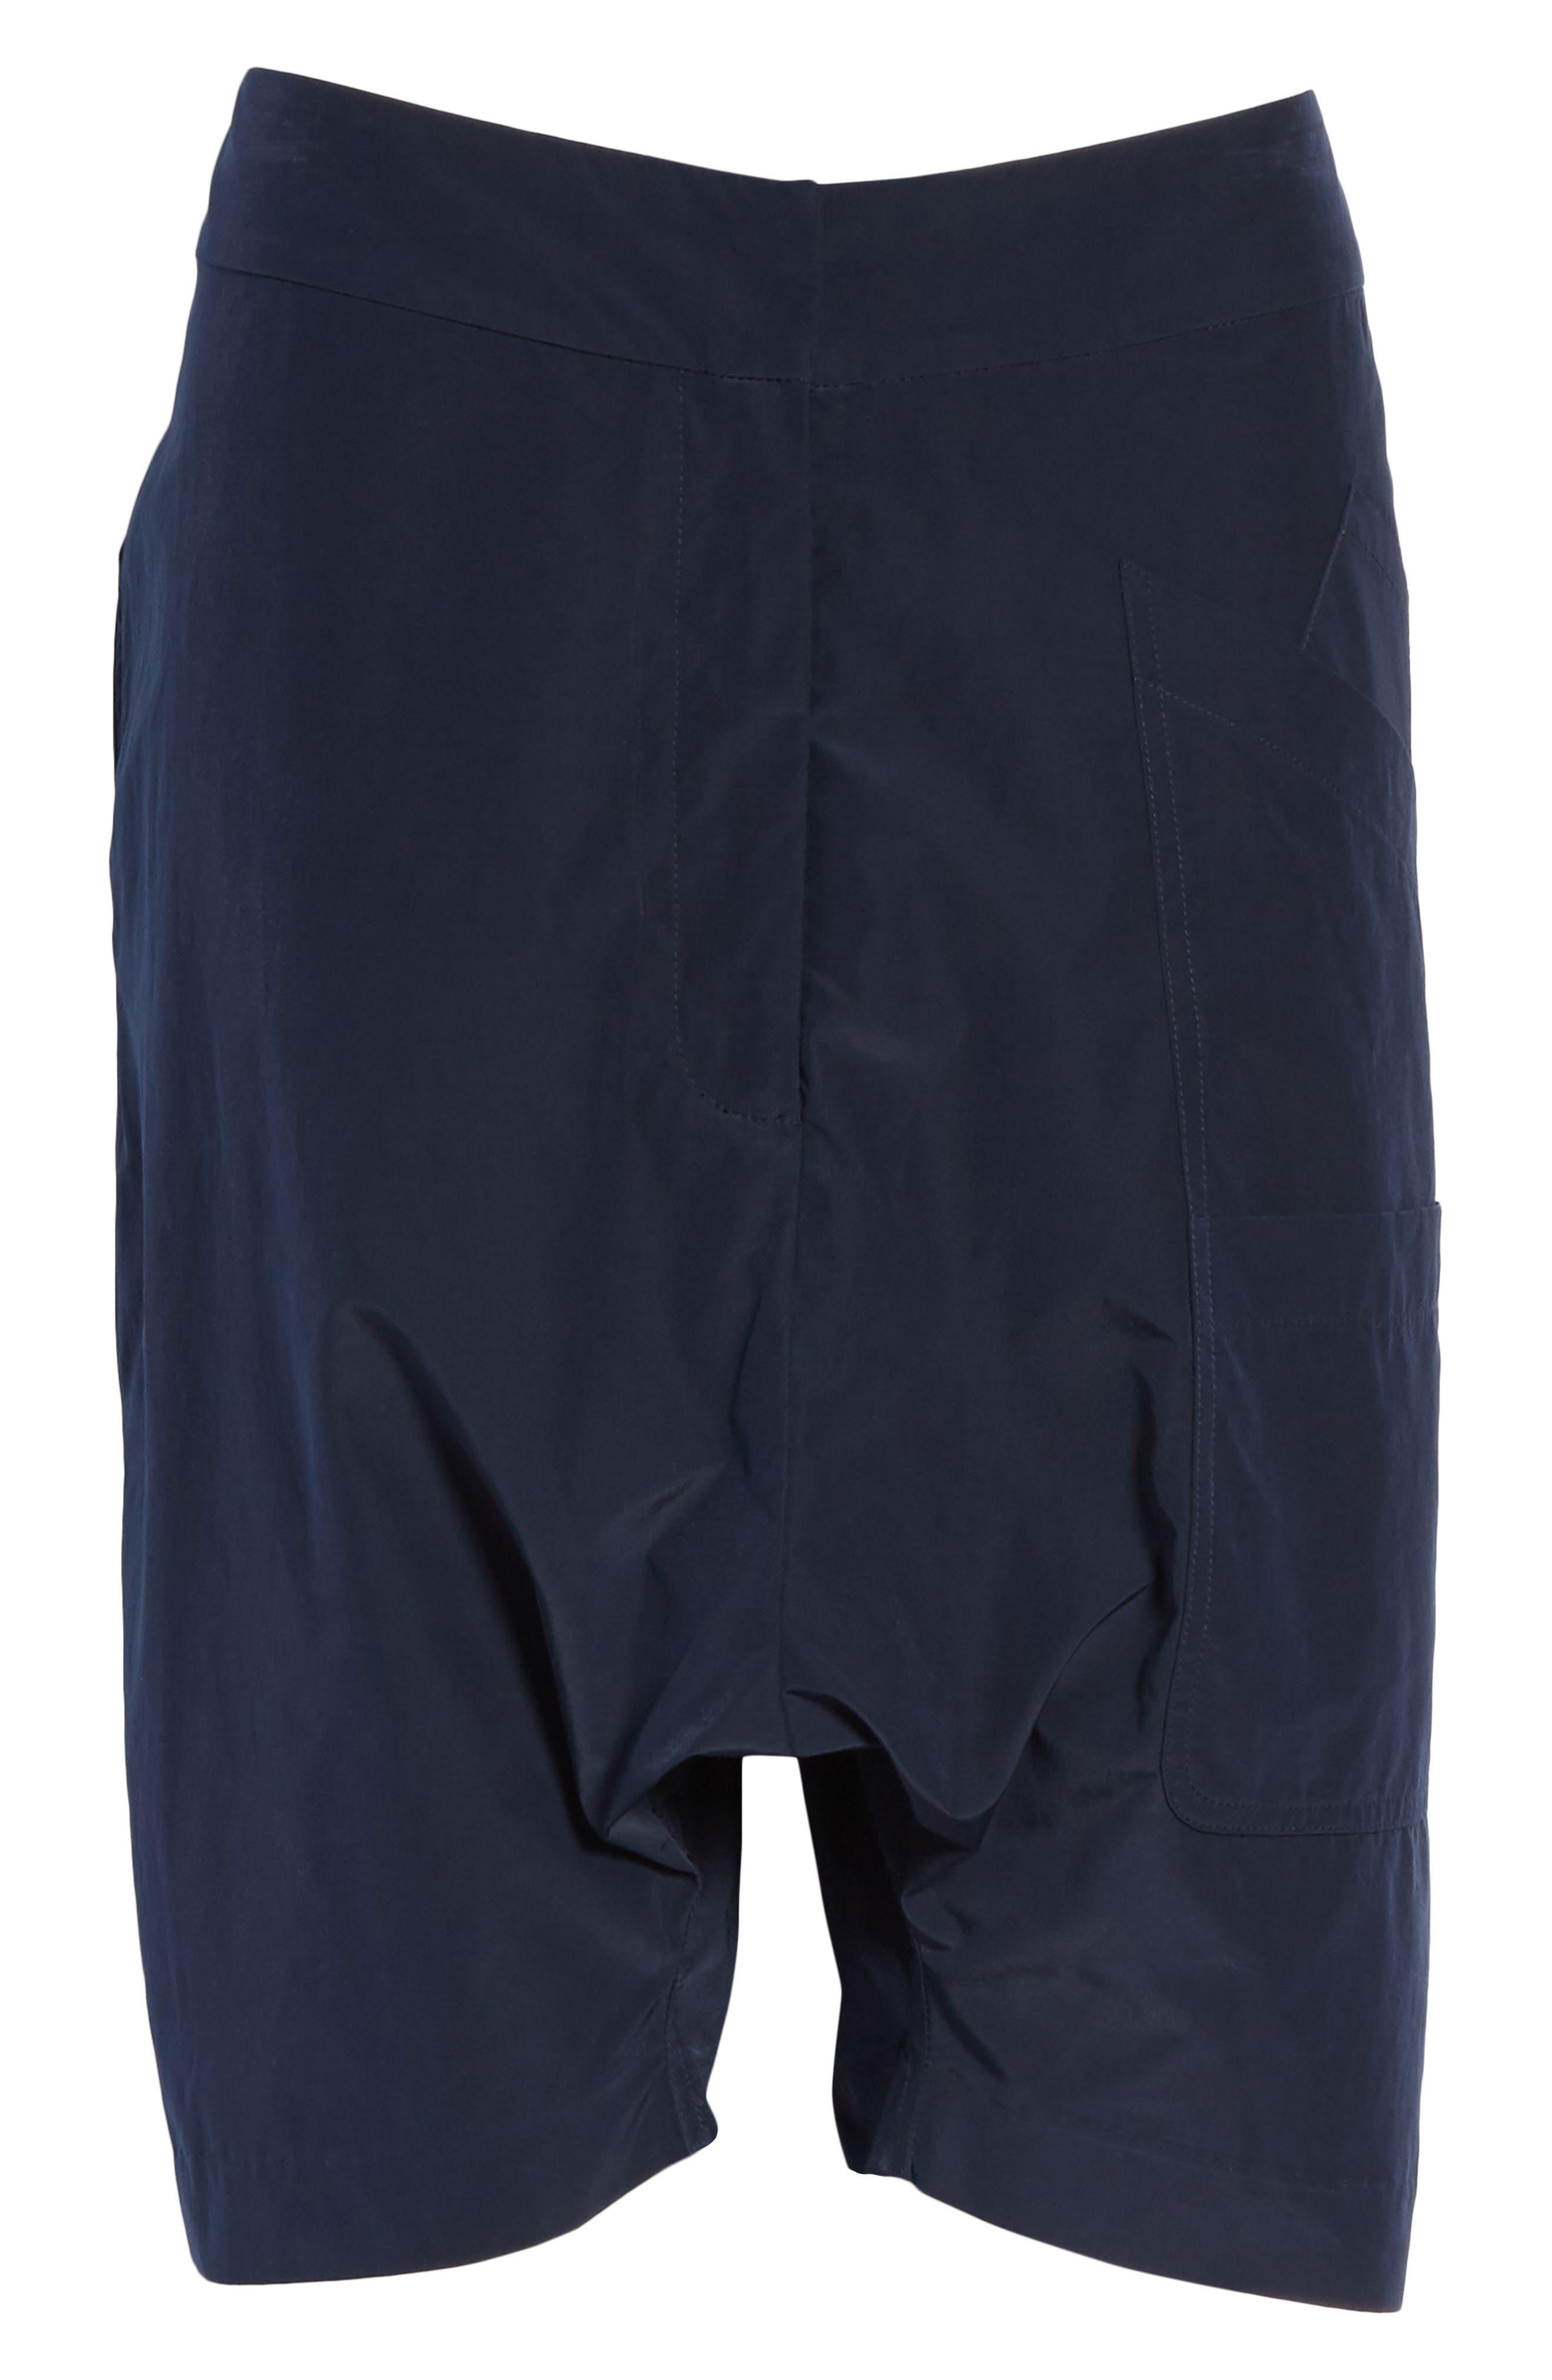 Drop Crotch Shorts,                             Alternate thumbnail 6, color,                             Navy